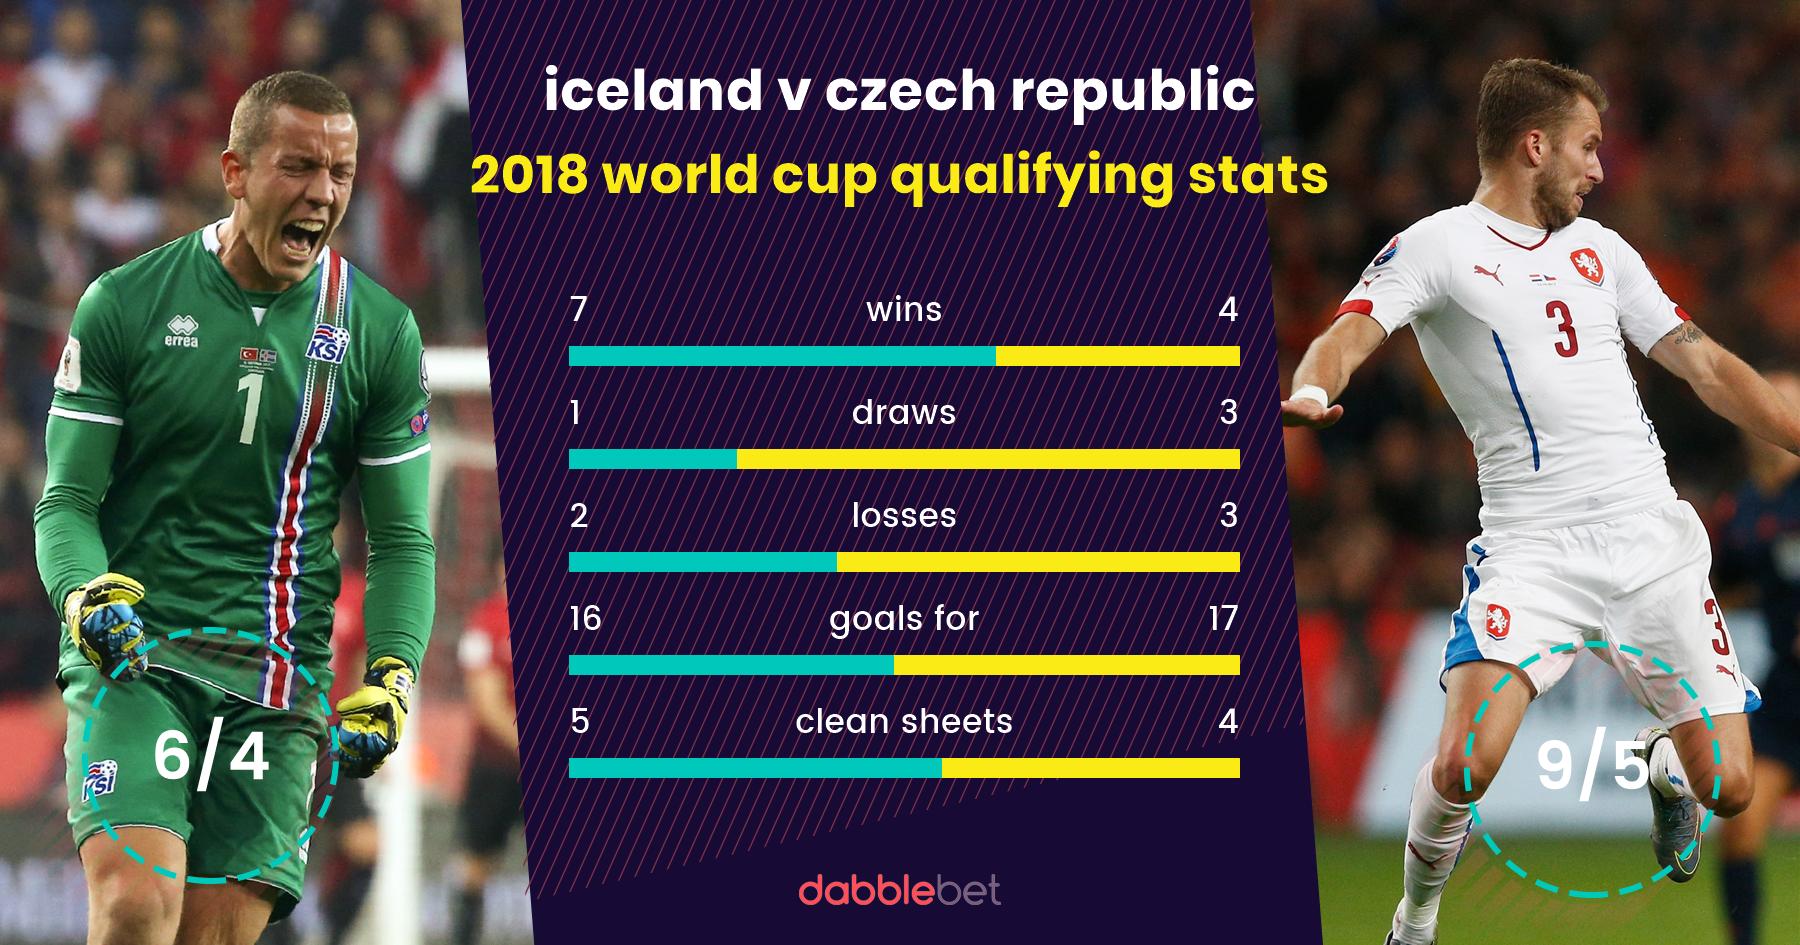 Iceland Czech Republic graphic